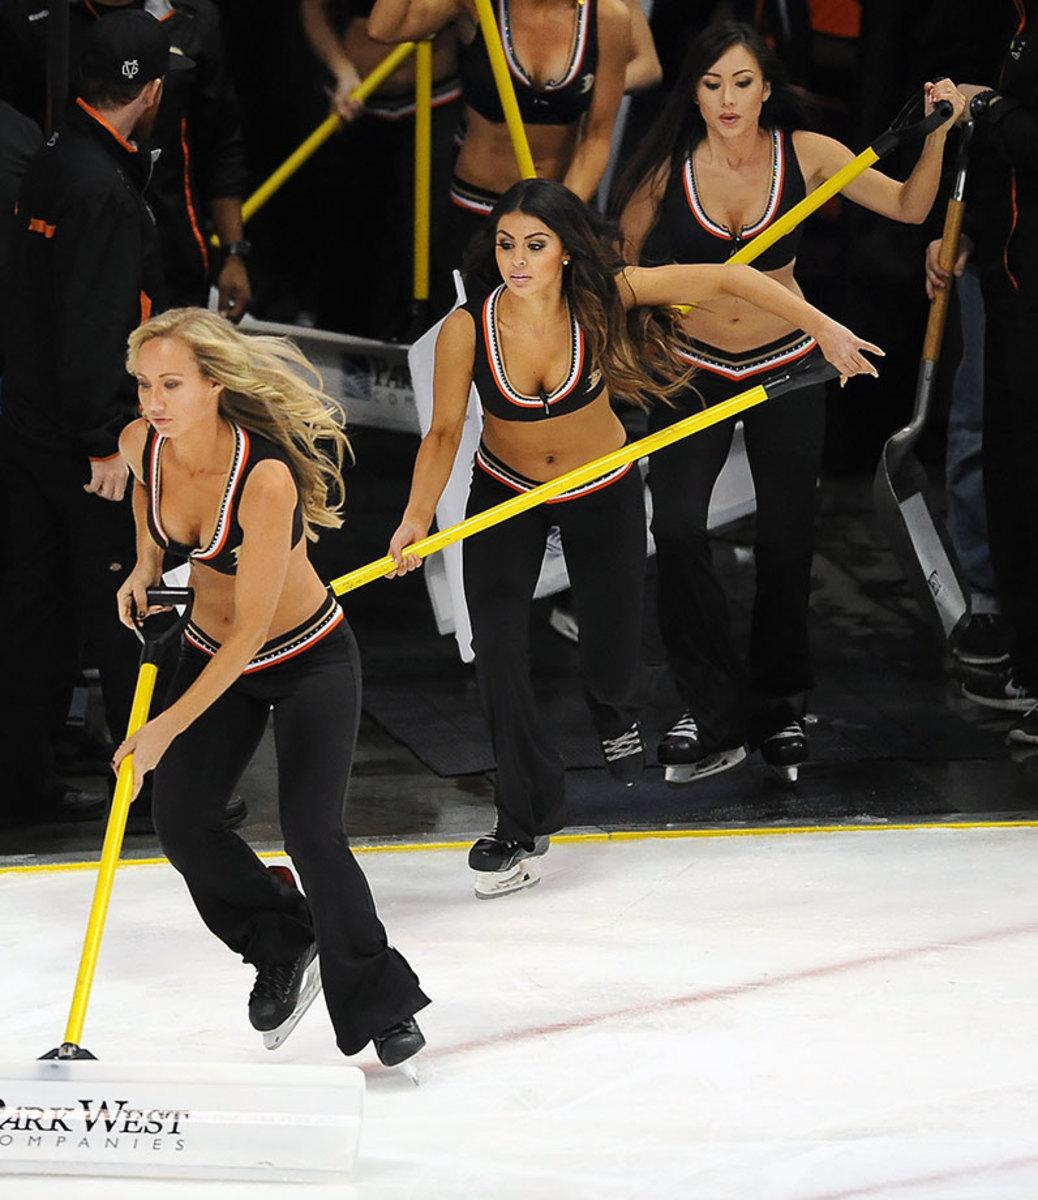 Anaheim-Ducks-Power-Players-Ice-Girls-506151001009_Avalanche_at_Ducks.jpg